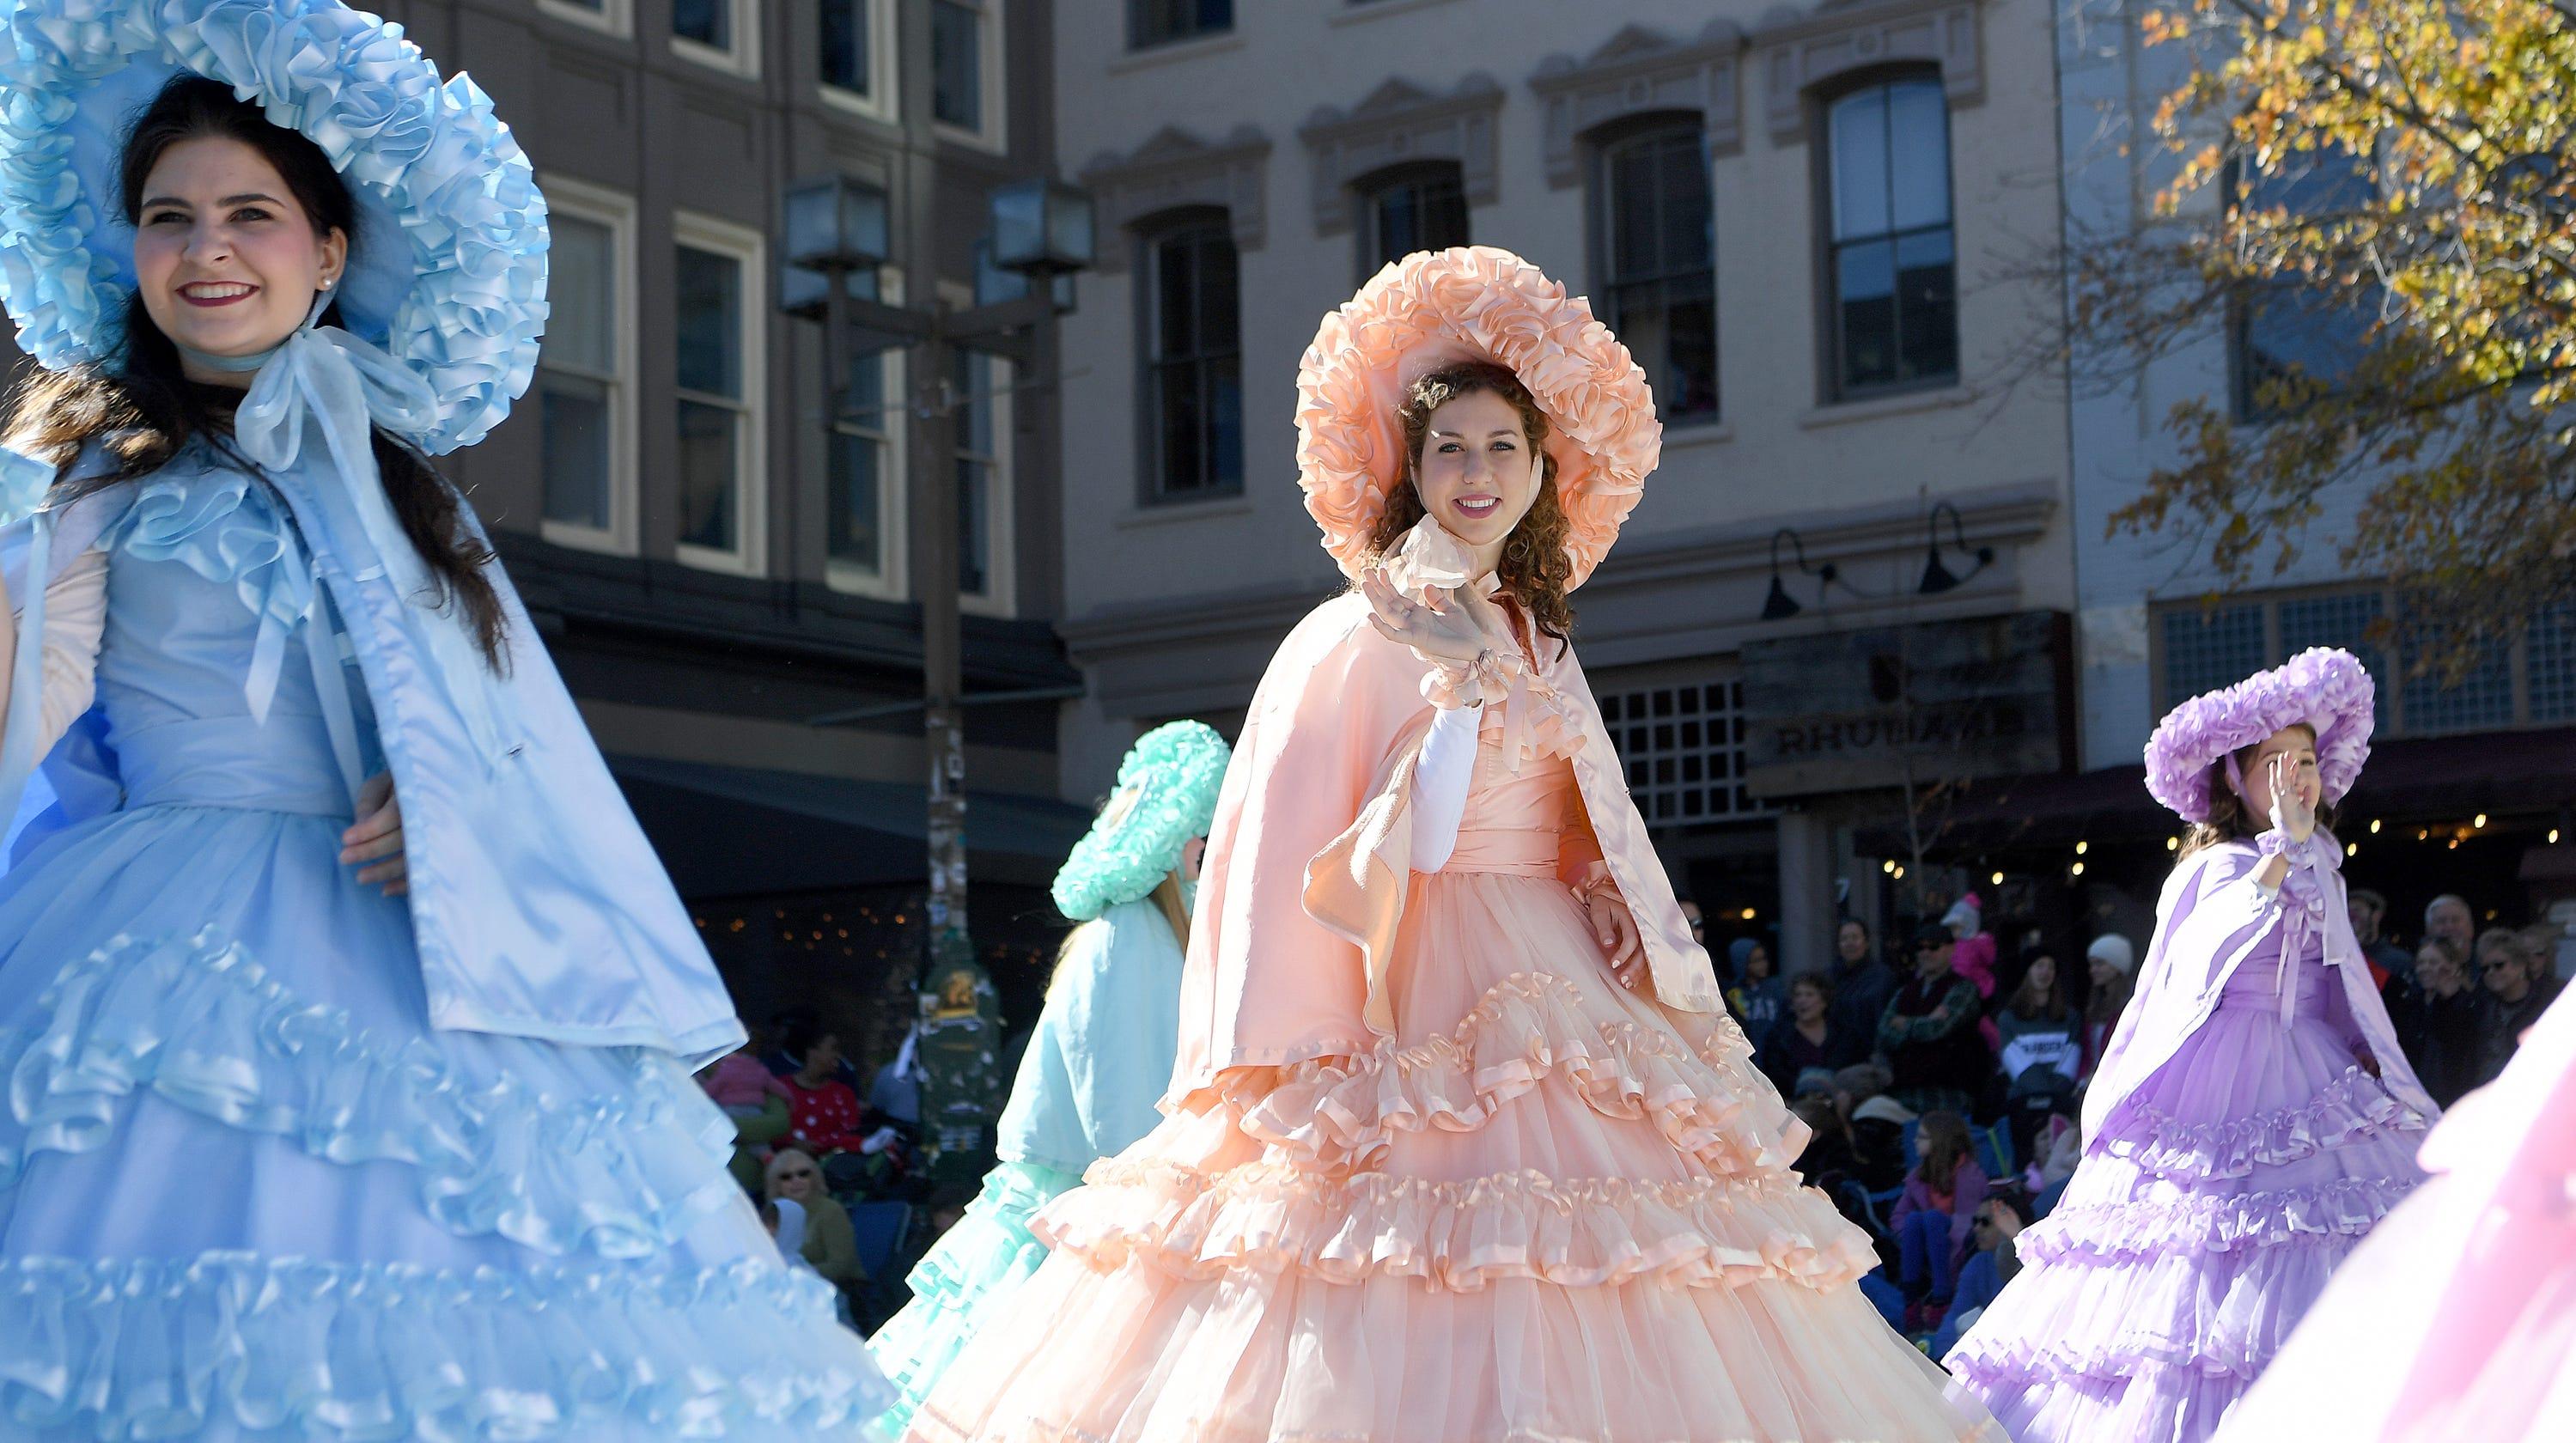 Boyle column: Southern belles at Asheville parade an odd addition